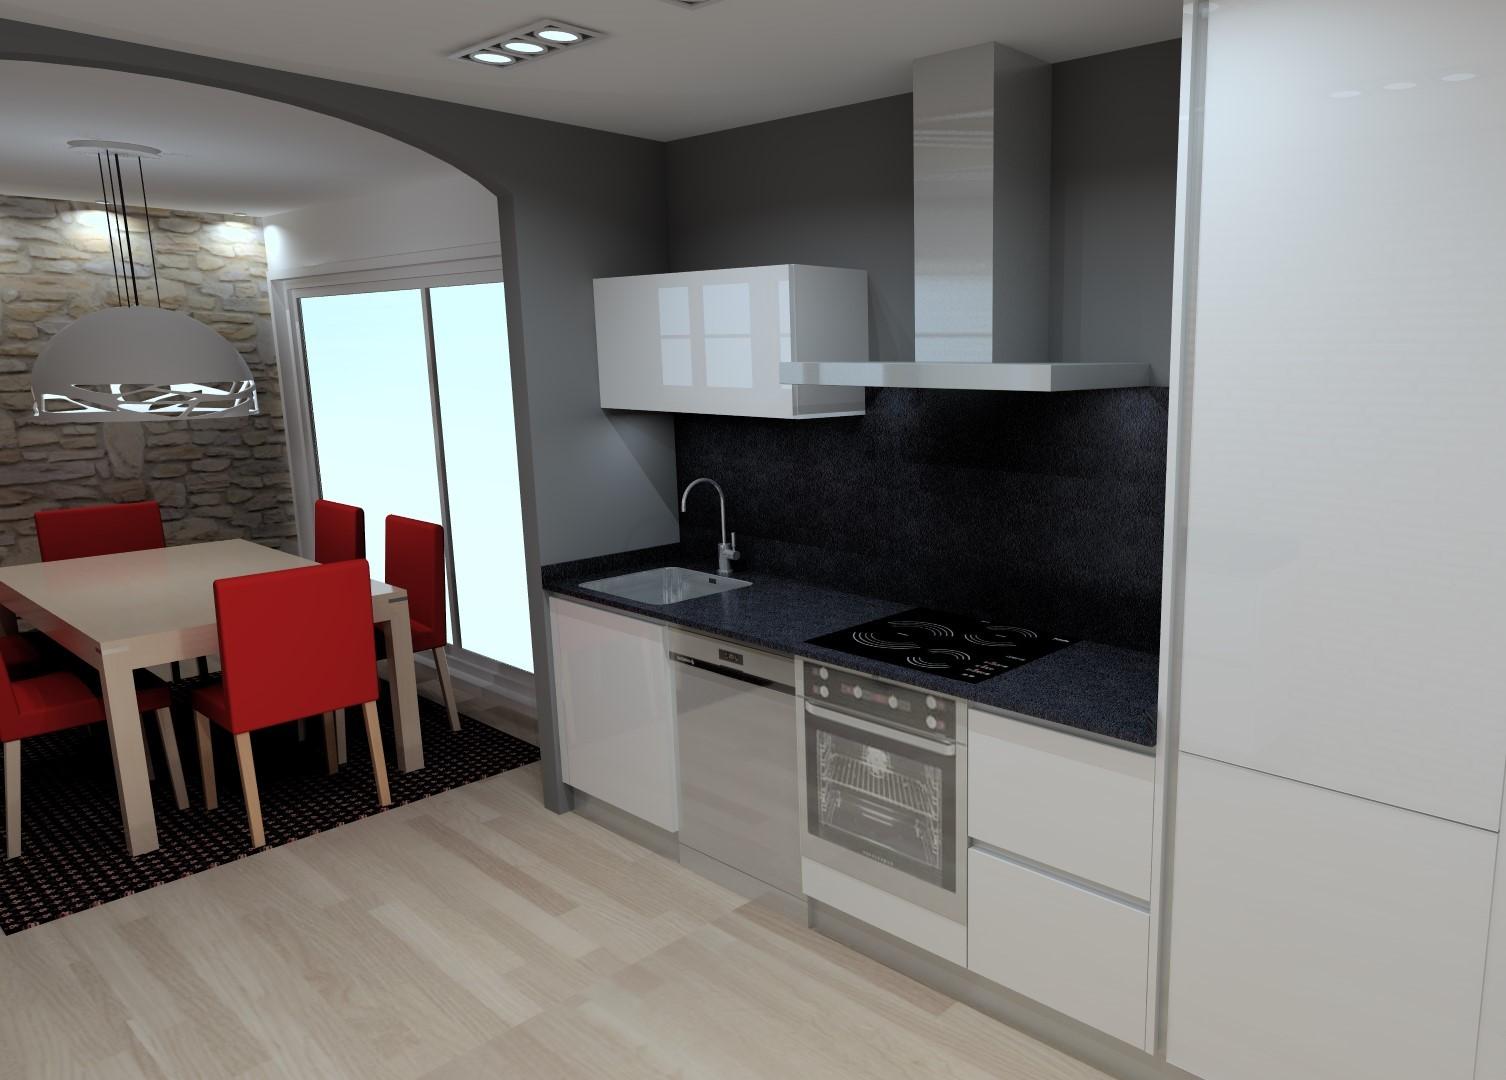 343433 1 proyectos de cocina for Proyectos de cocina